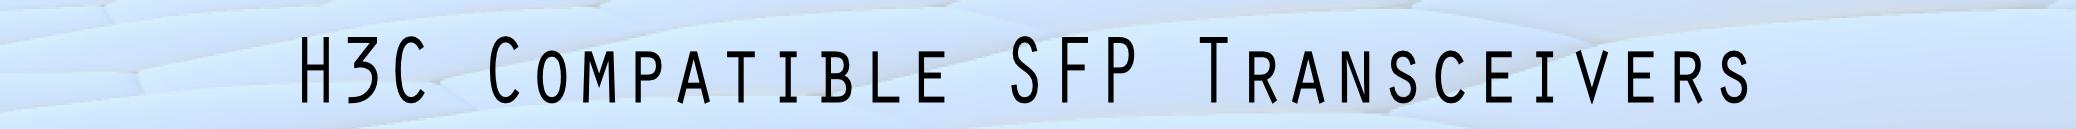 H3C Gigabit Ethernet Fiber Optical SFP Transceiver Modules